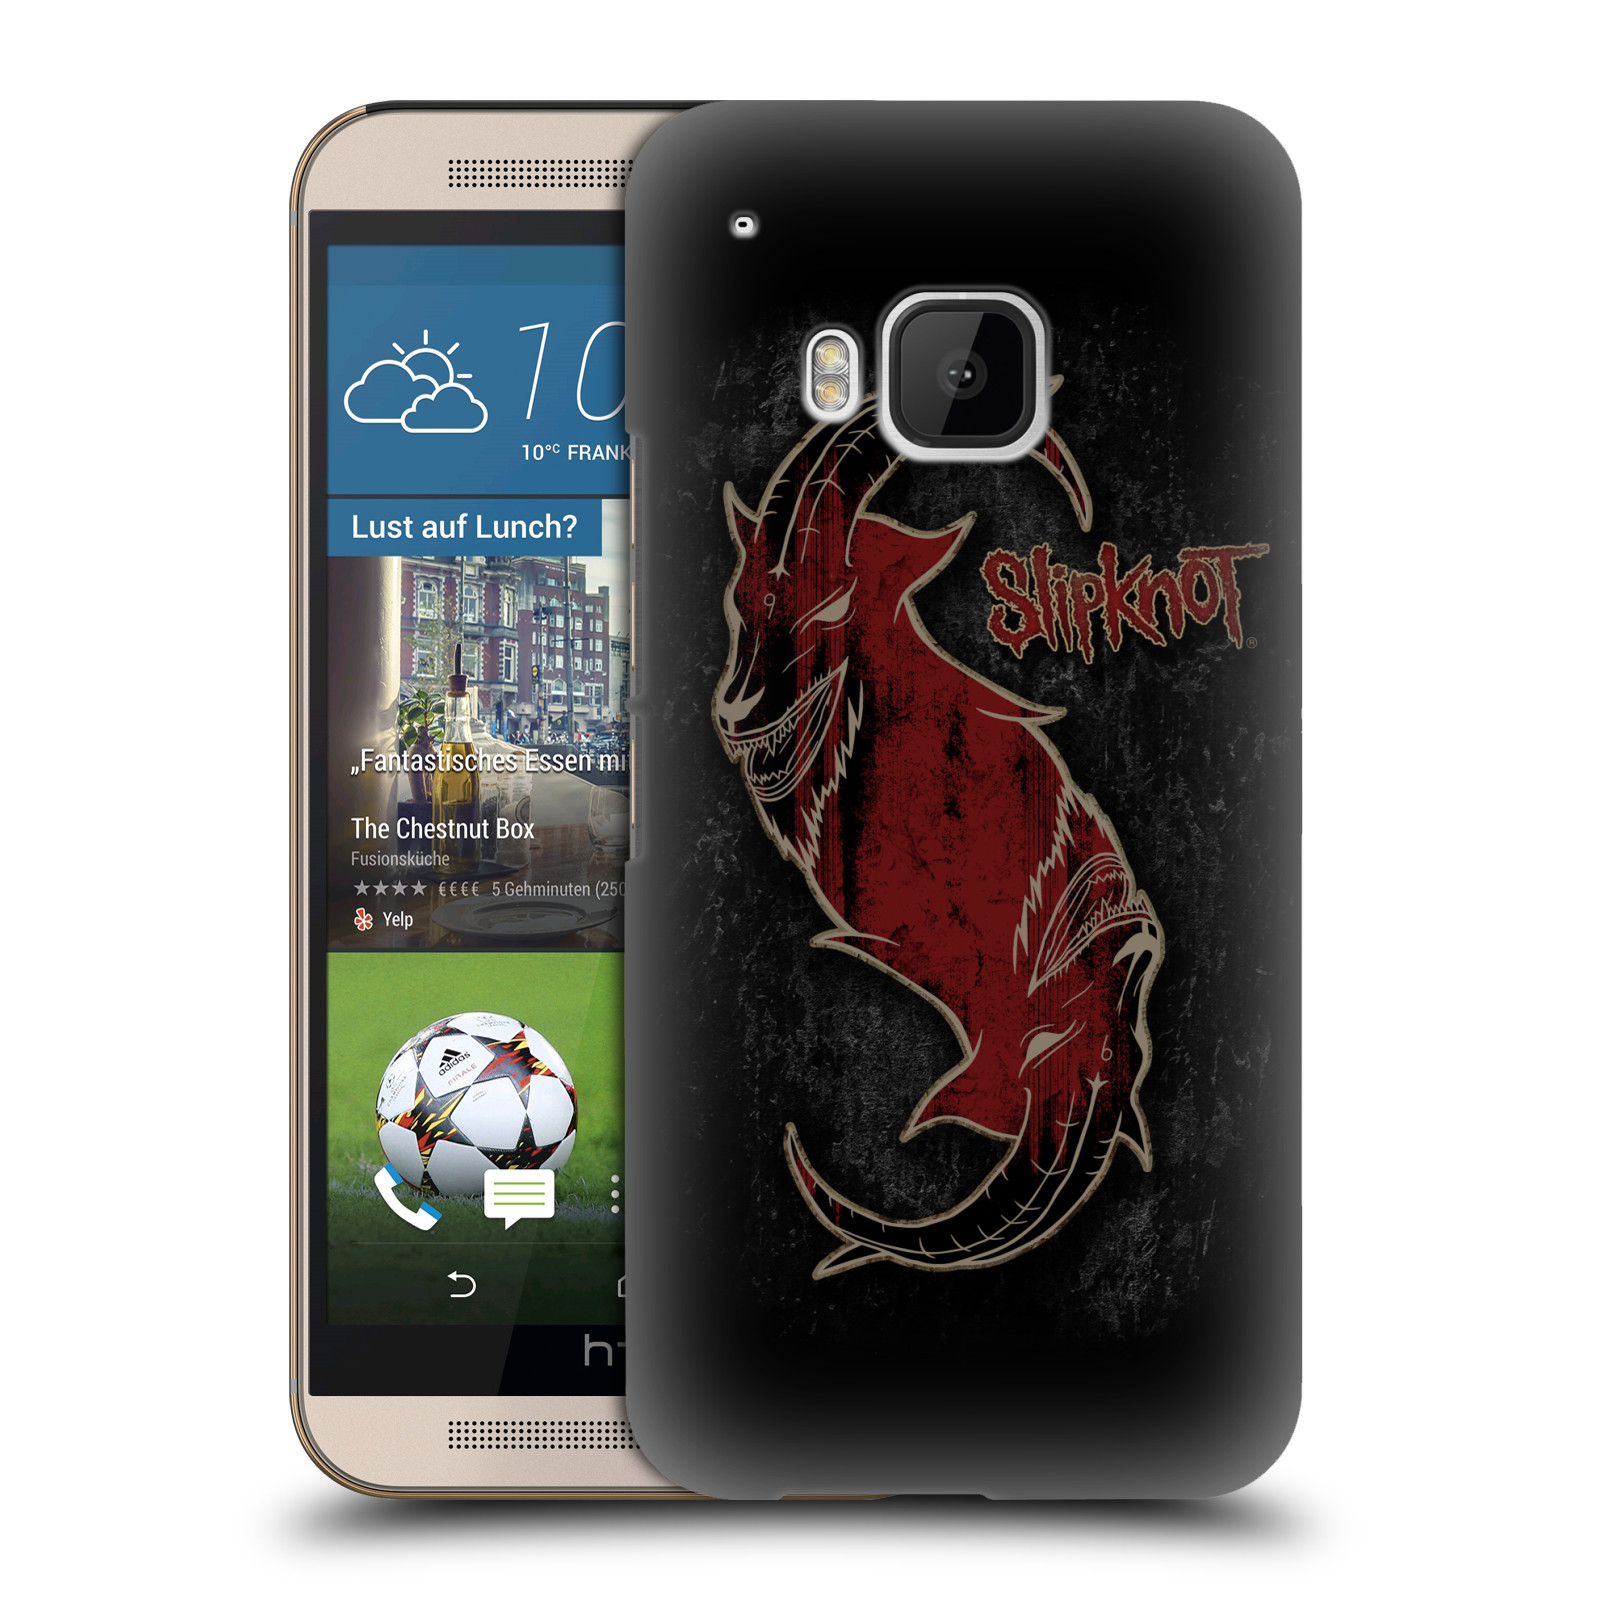 Plastové pouzdro na mobil HTC ONE M9 HEAD CASE Slipknot - Rudý kozel